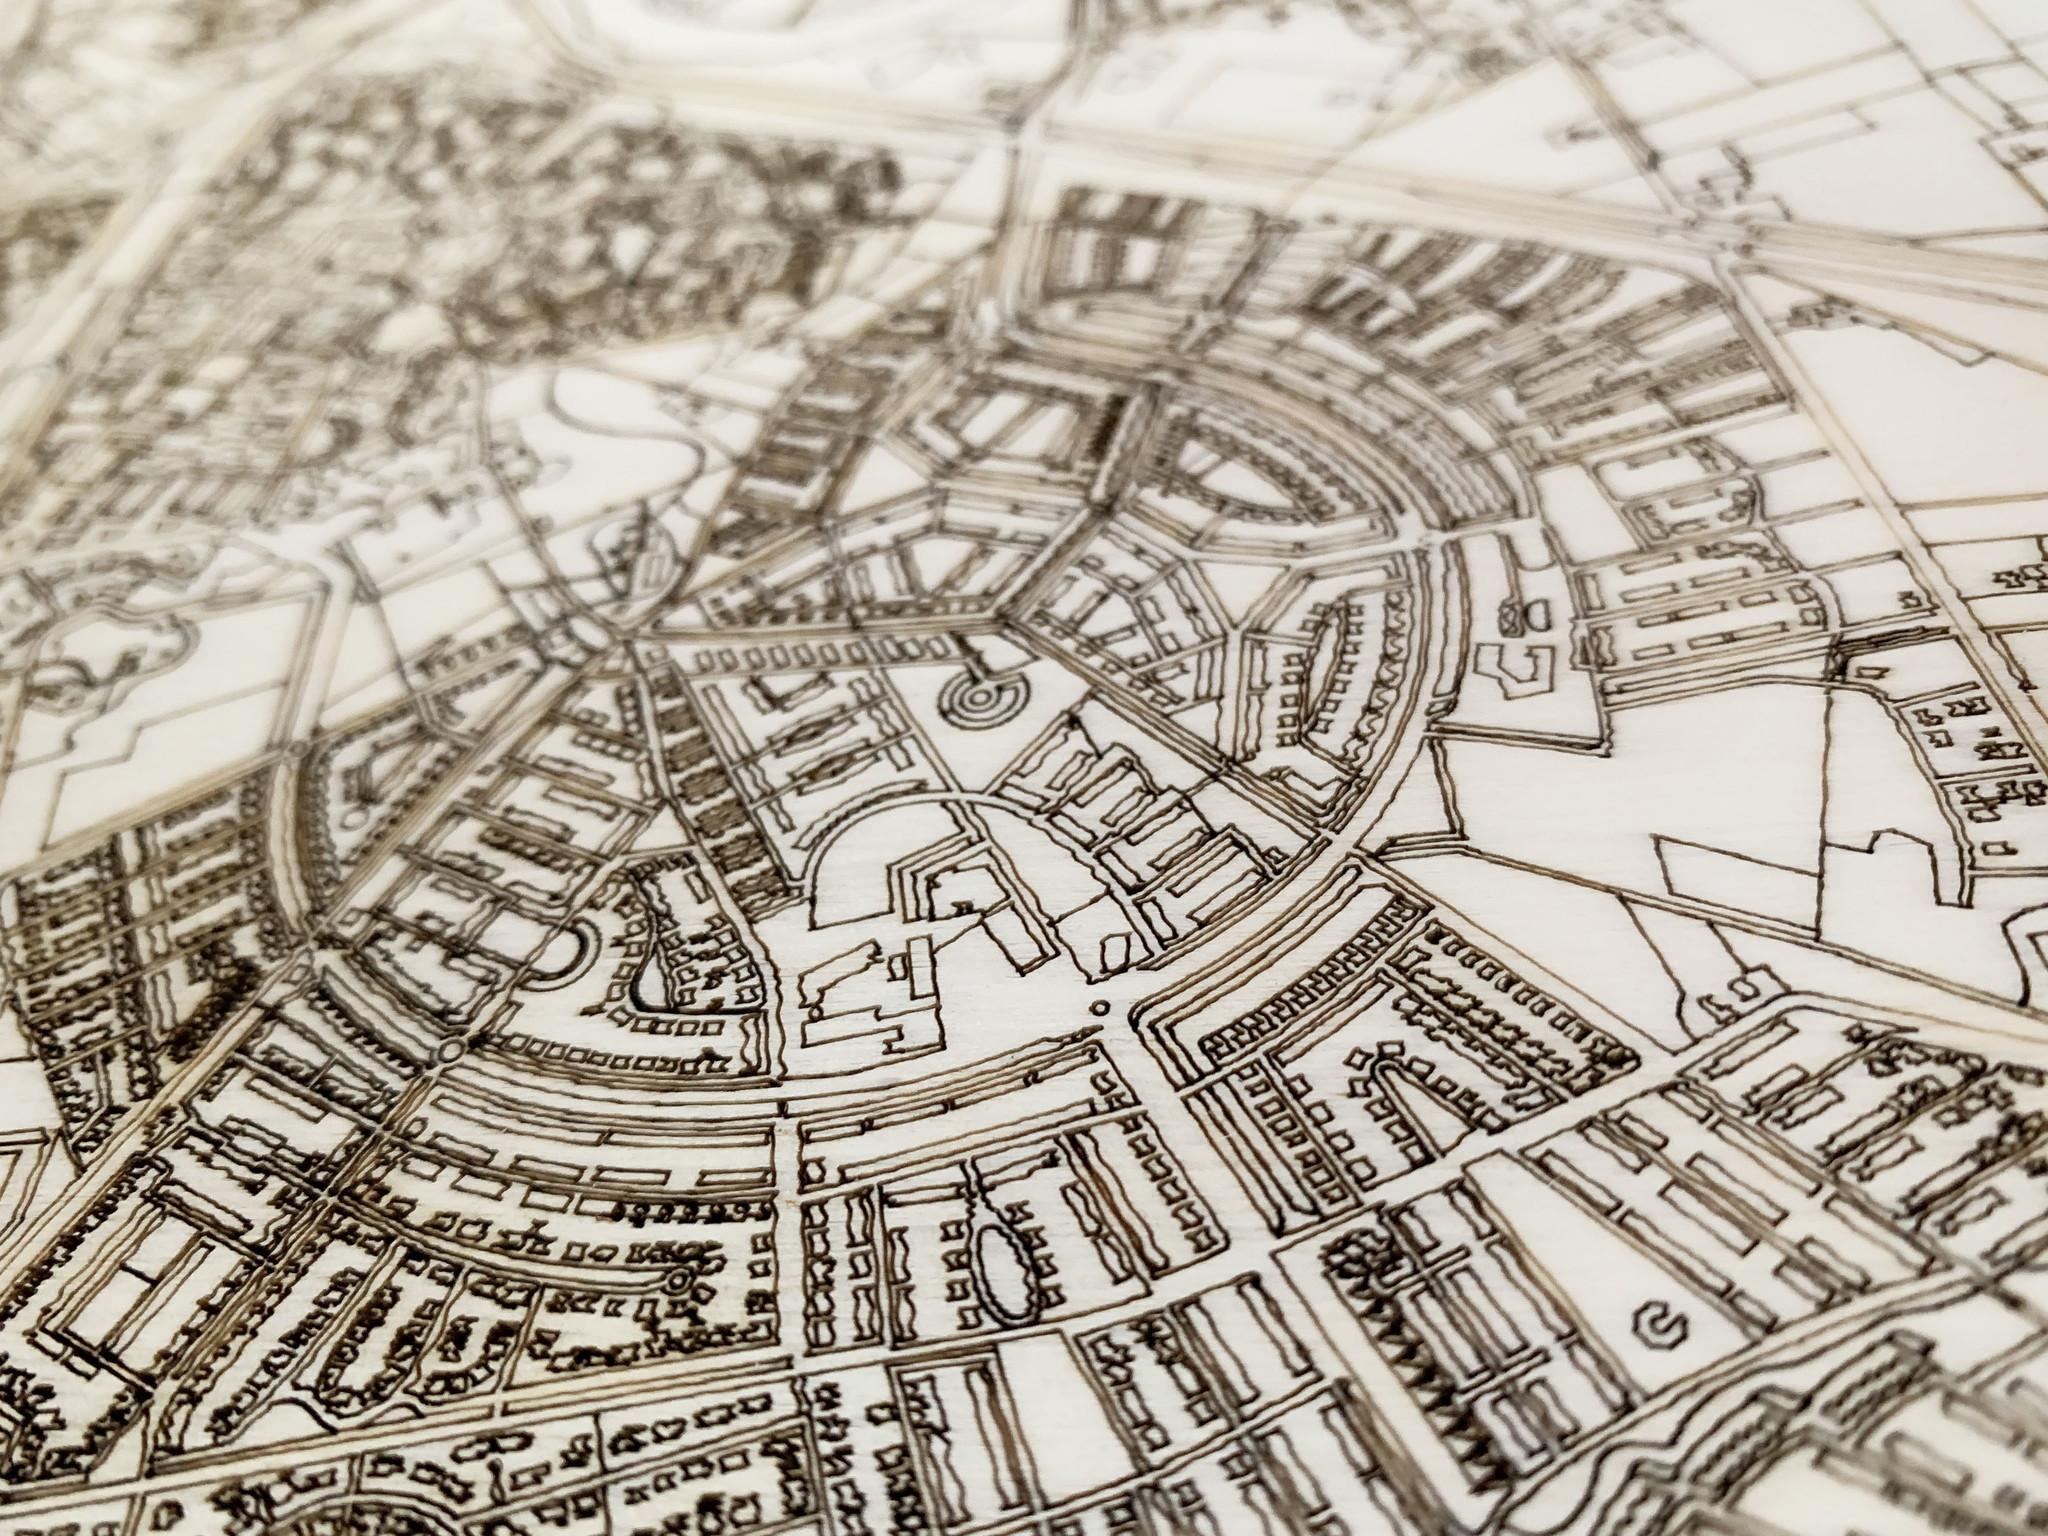 Houten stadsplattegrond Maastricht-4